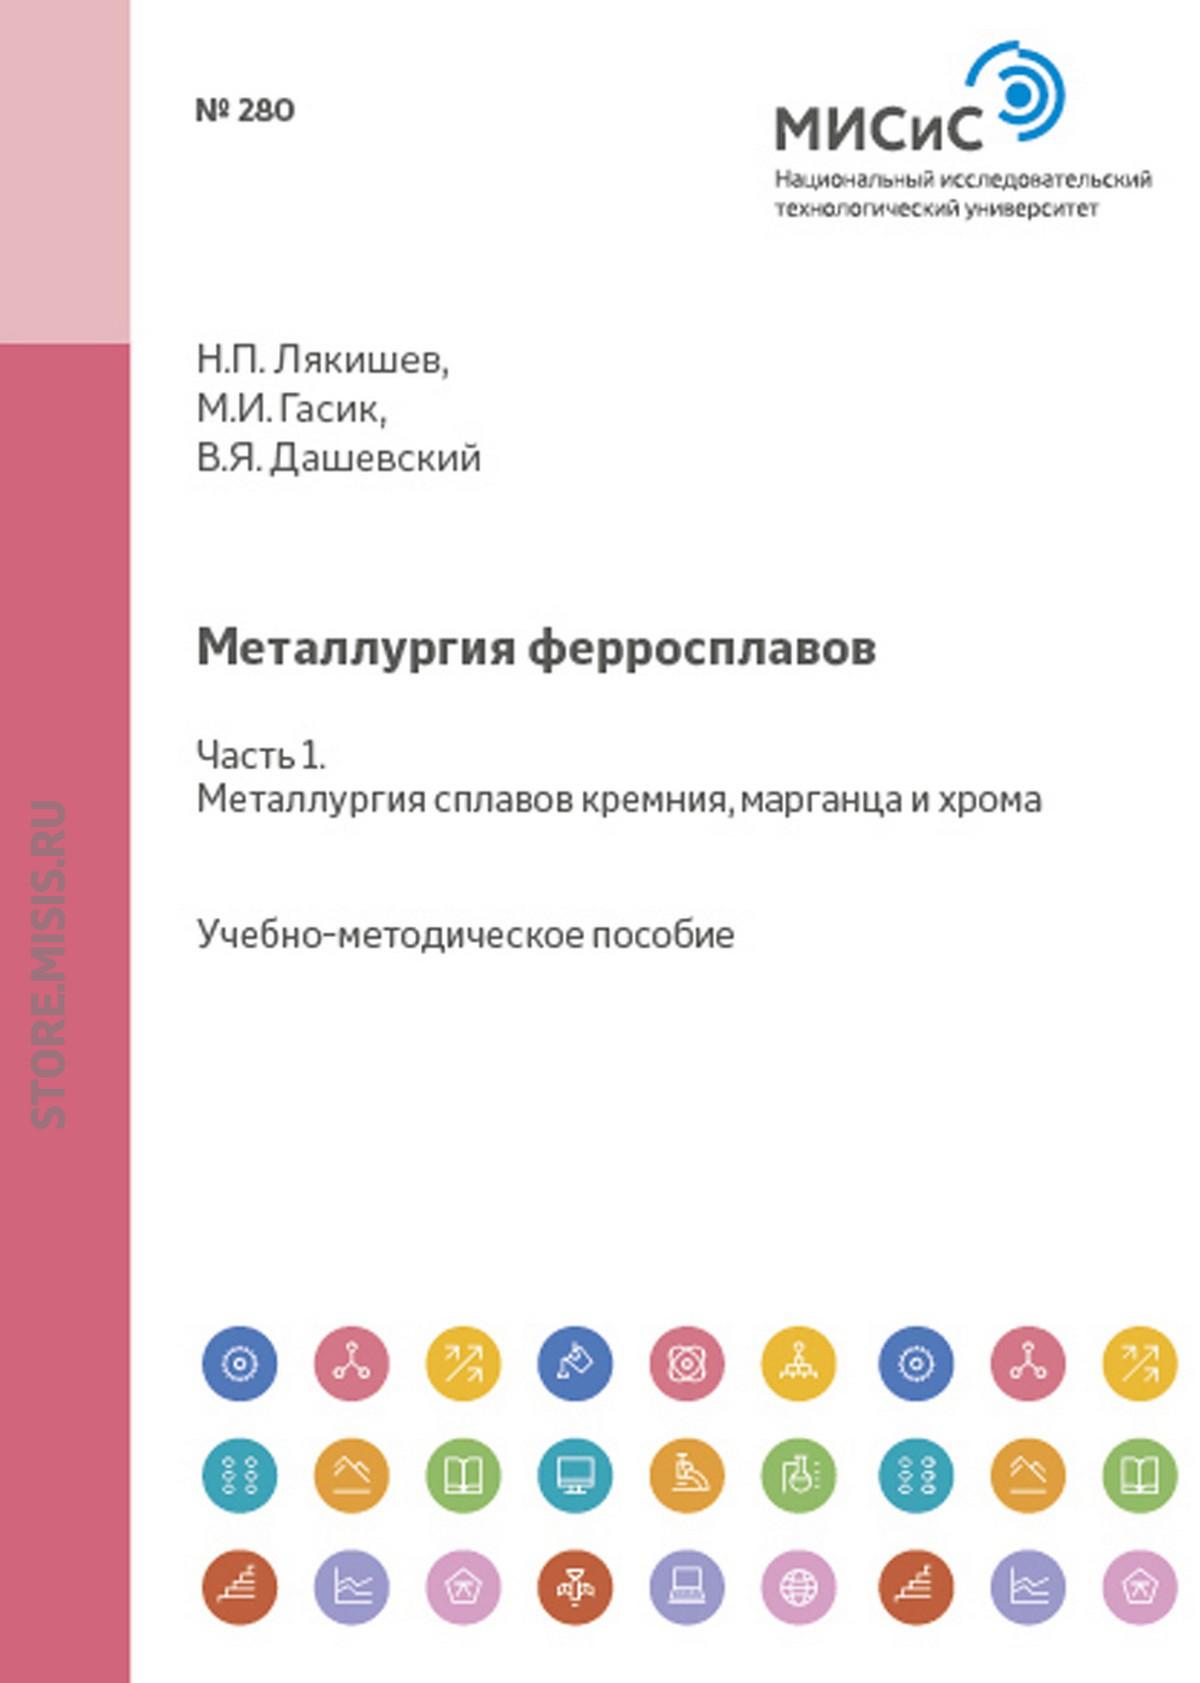 Николай Лякишев Металлургия ферросплавов. Часть 1. Металлургия сплавов кремния, марганца и хрома